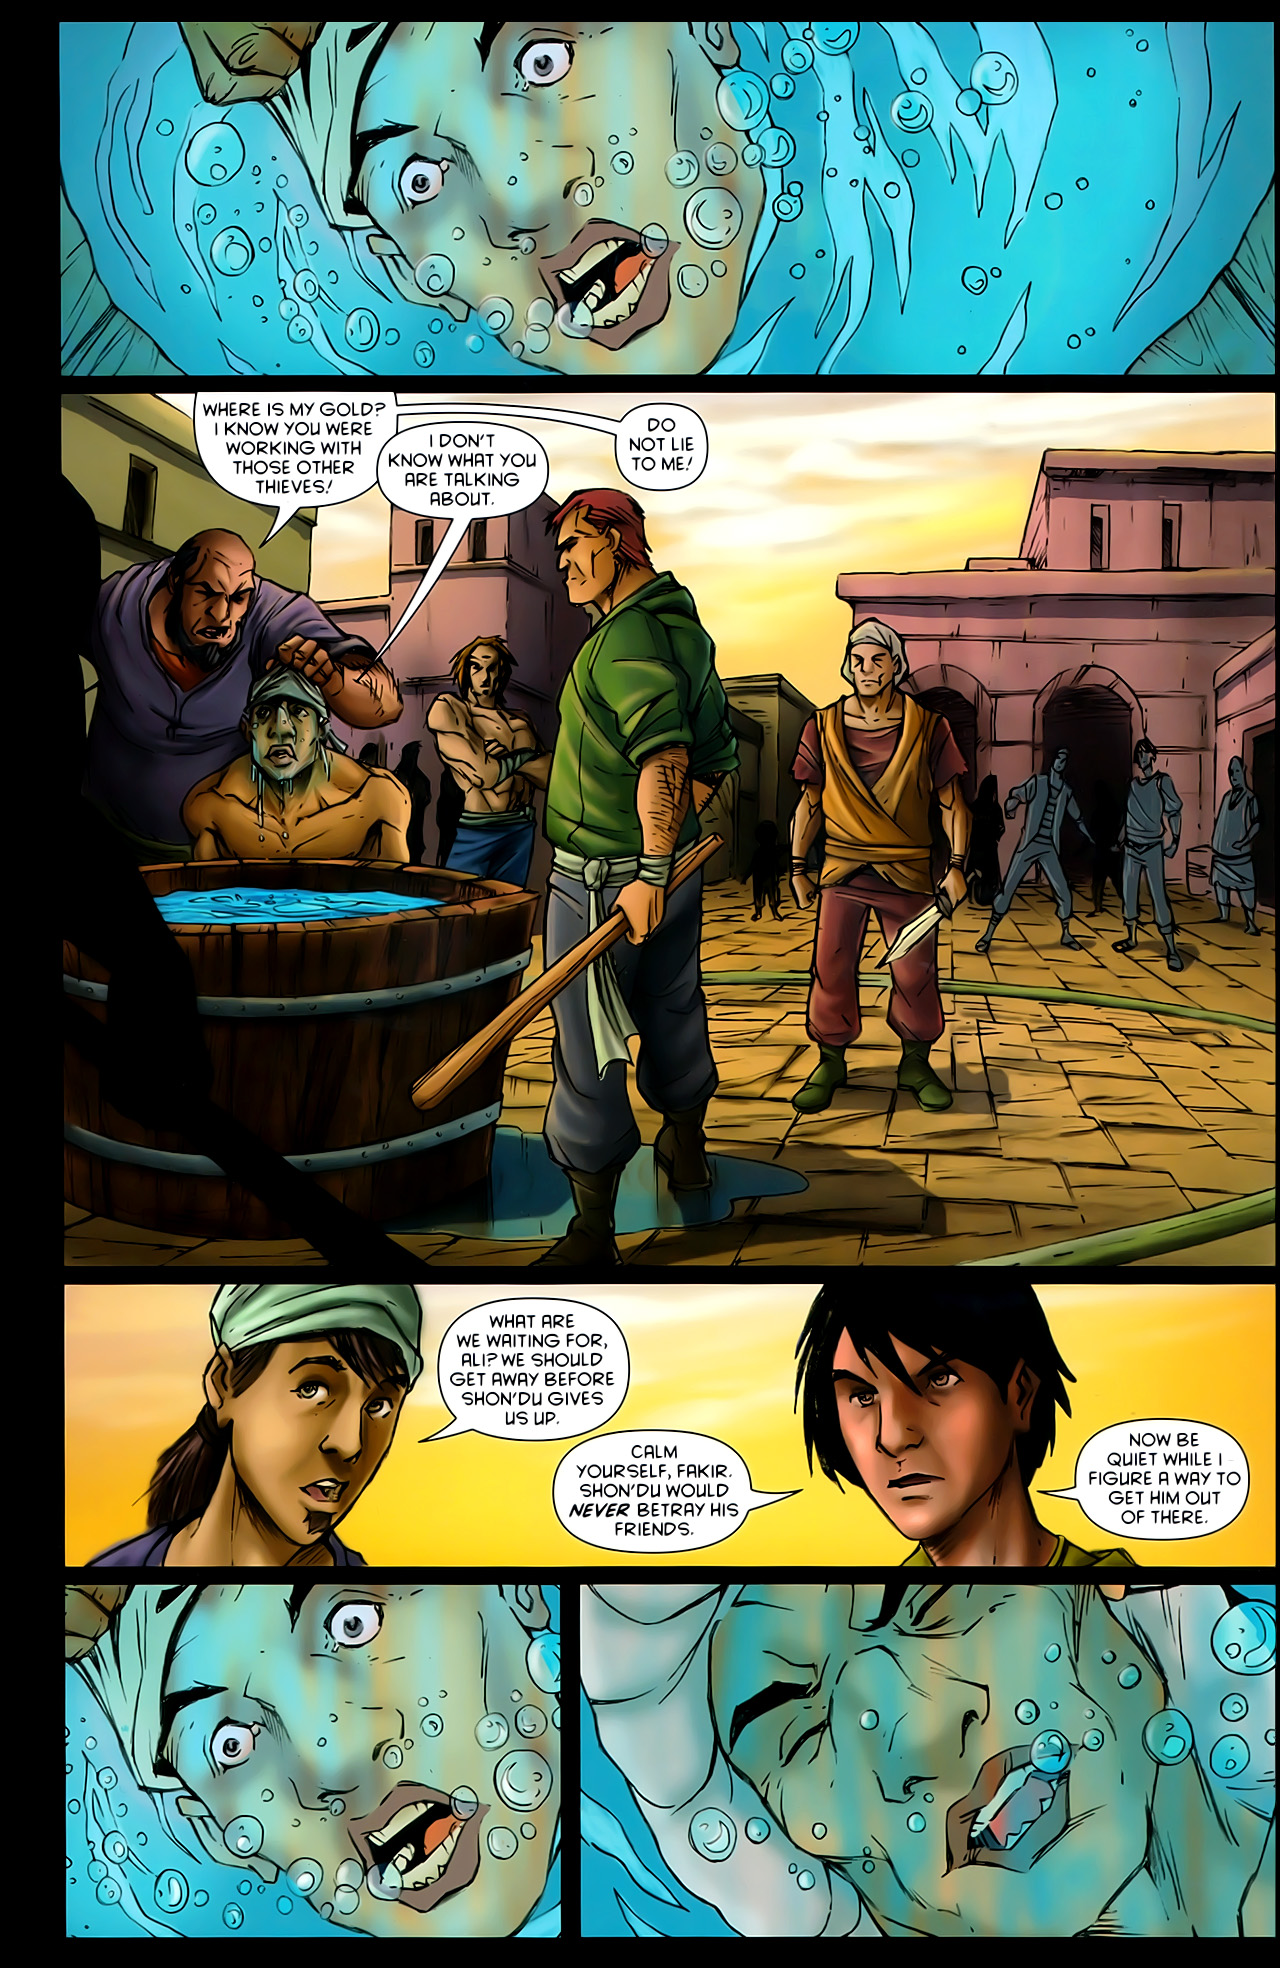 Read online 1001 Arabian Nights: The Adventures of Sinbad comic -  Issue #10 - 3